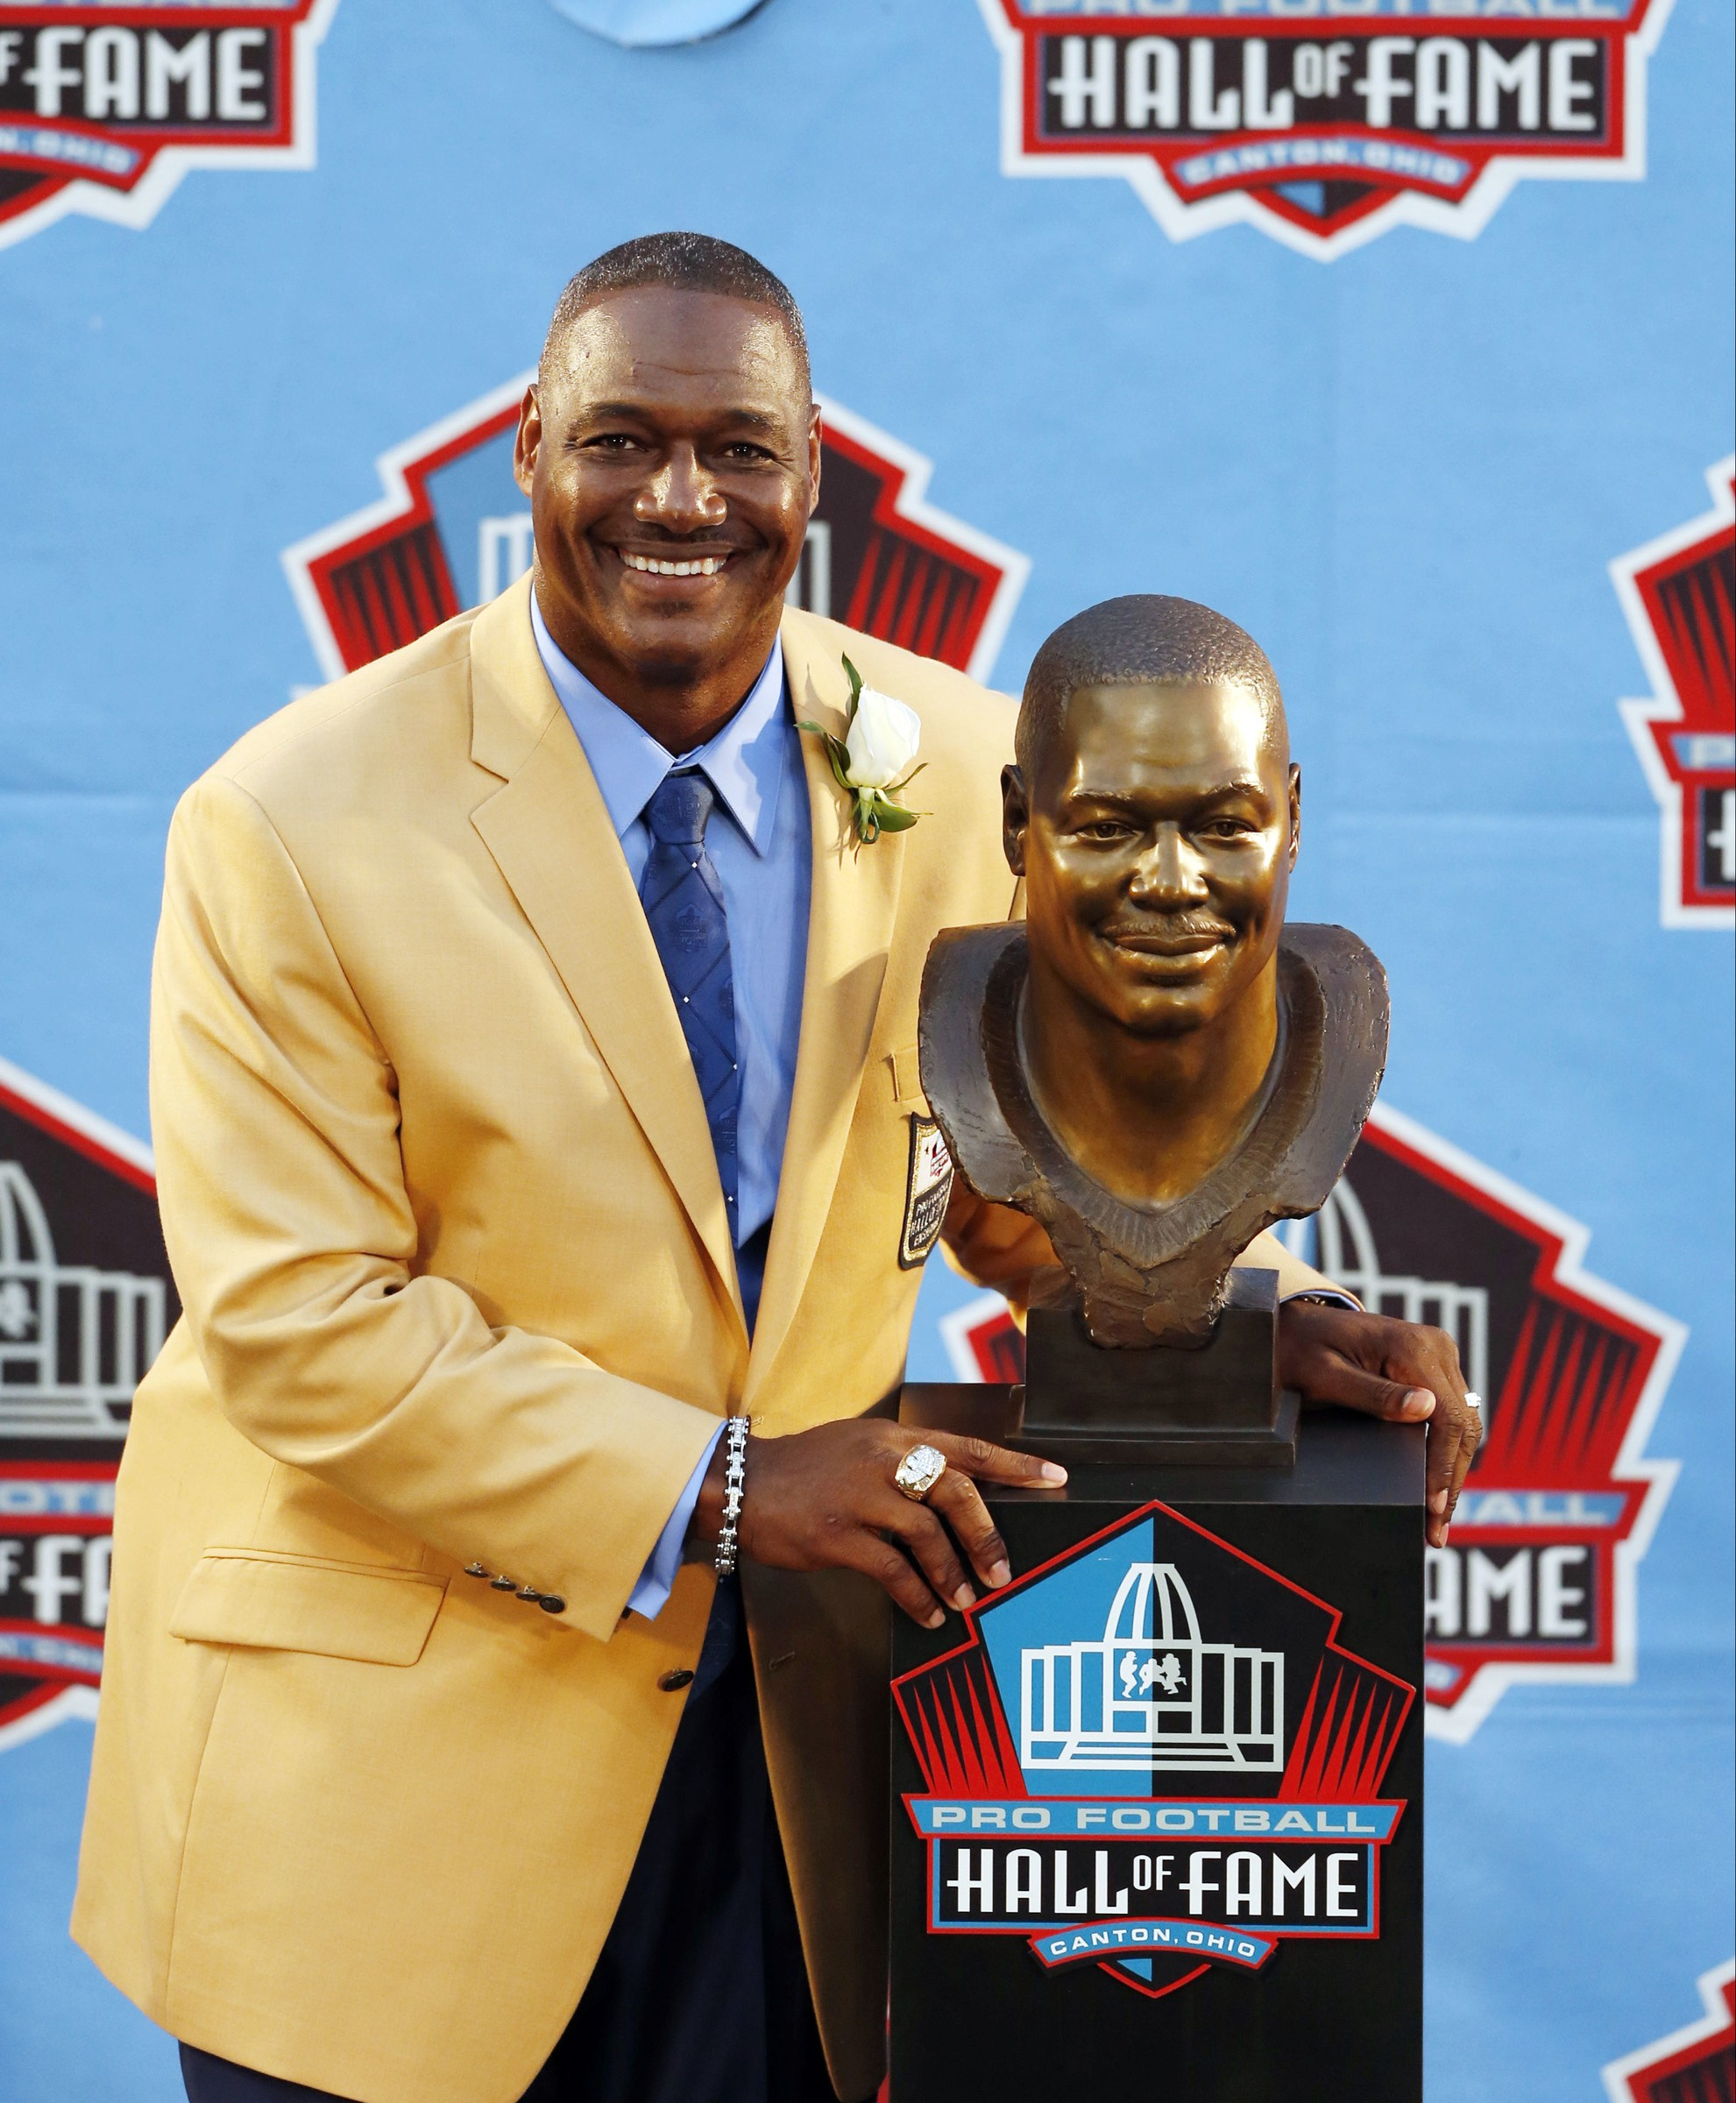 Derrick Brooks, Executive Director   - NFL Hall of Fame  - Tampa Bay Storm  - NFLPA Appeals Officer